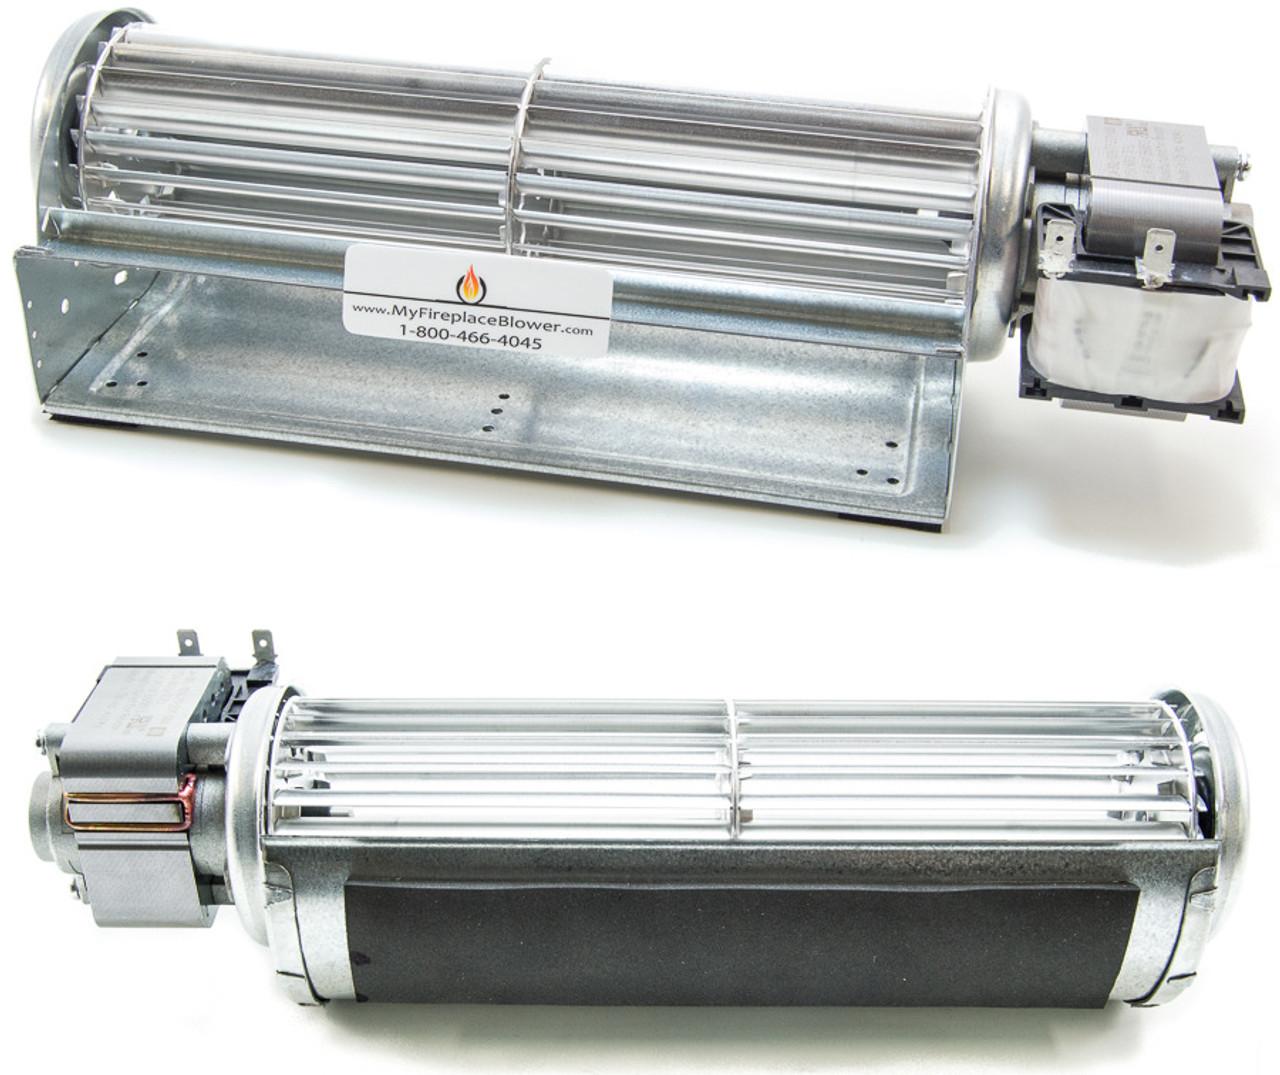 gfk4b fireplace blower motor for heatilator ndv3933 ndv3933i fireplaces  [ 1280 x 1075 Pixel ]